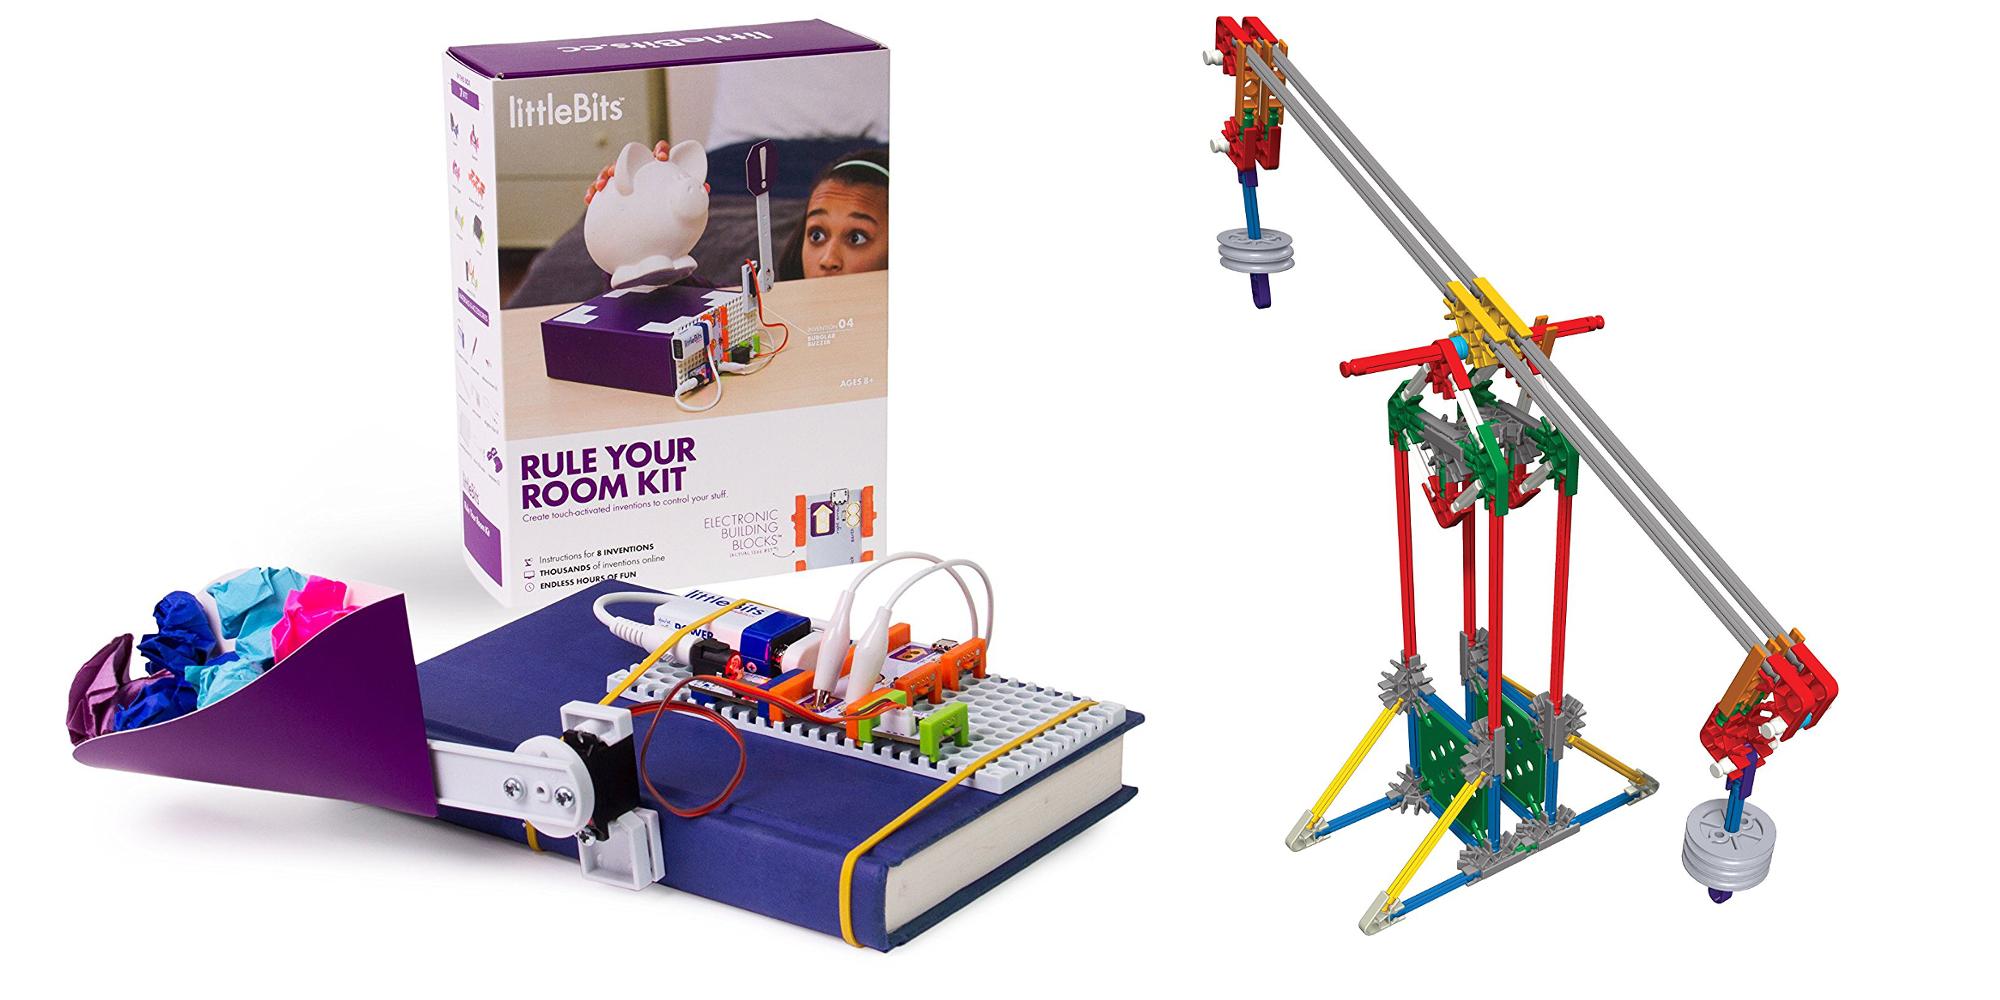 stem-toys-littlebits-sale-01